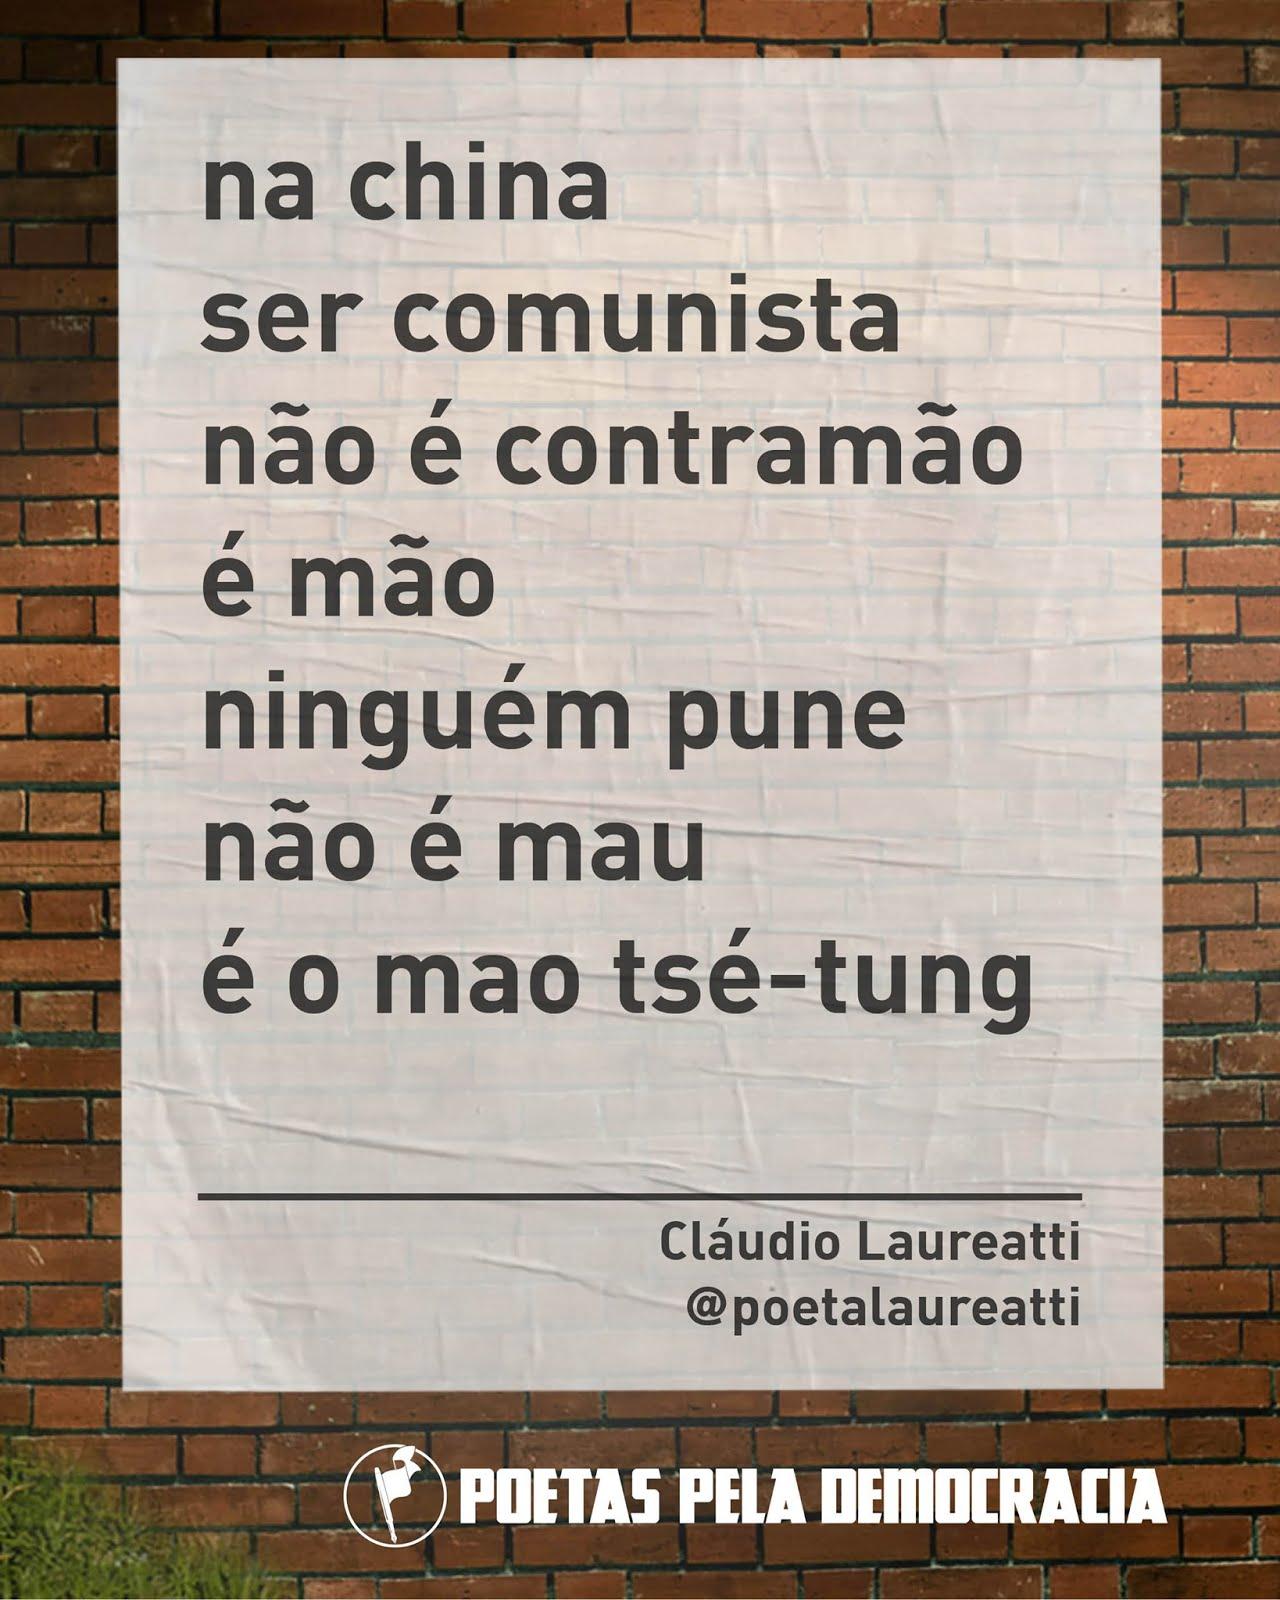 Poetas pela democracia